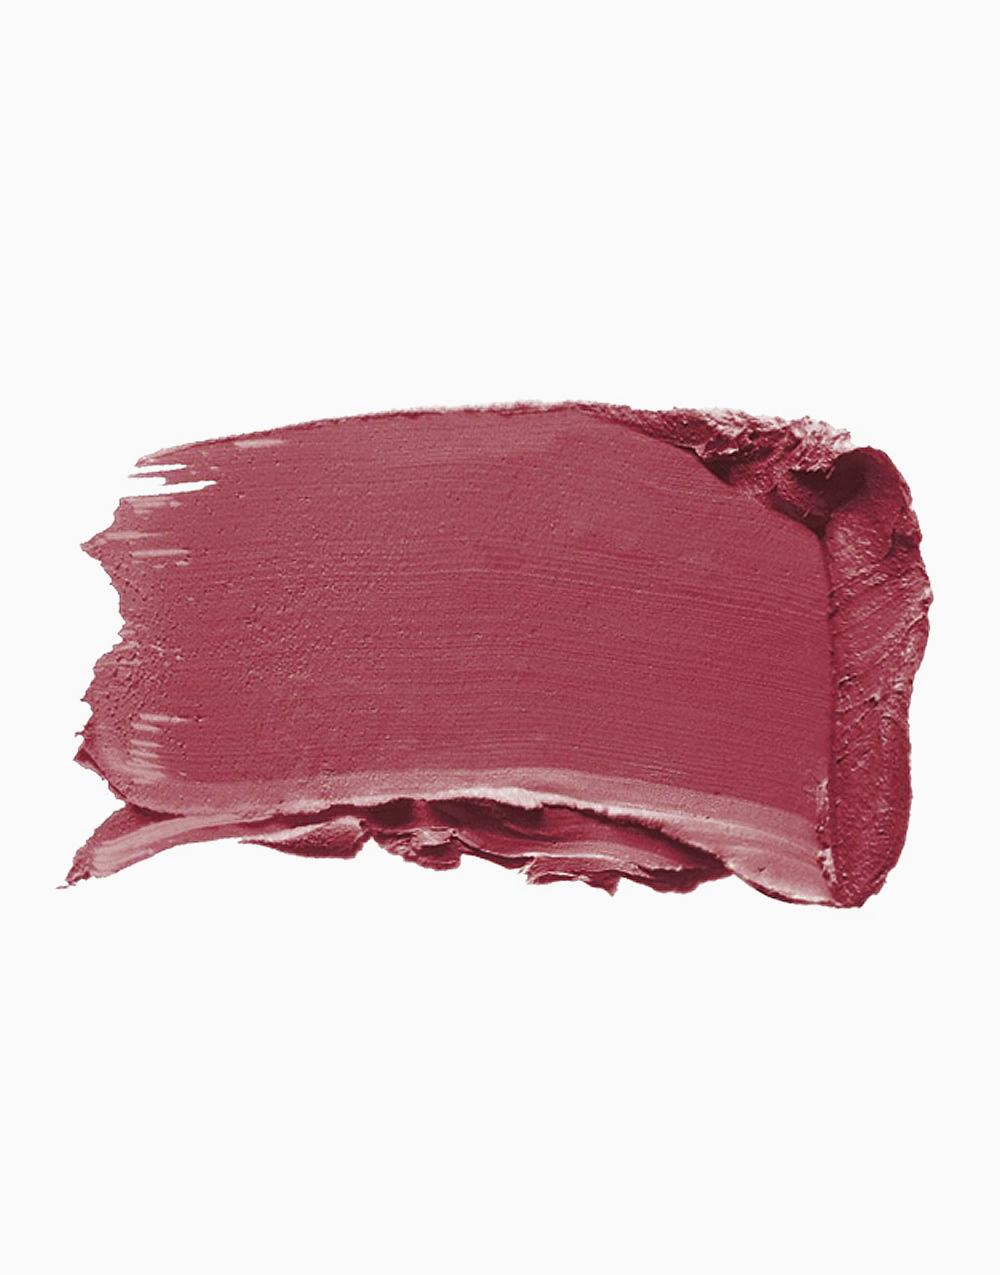 Creme Blush by Issy & Co. | Scandal